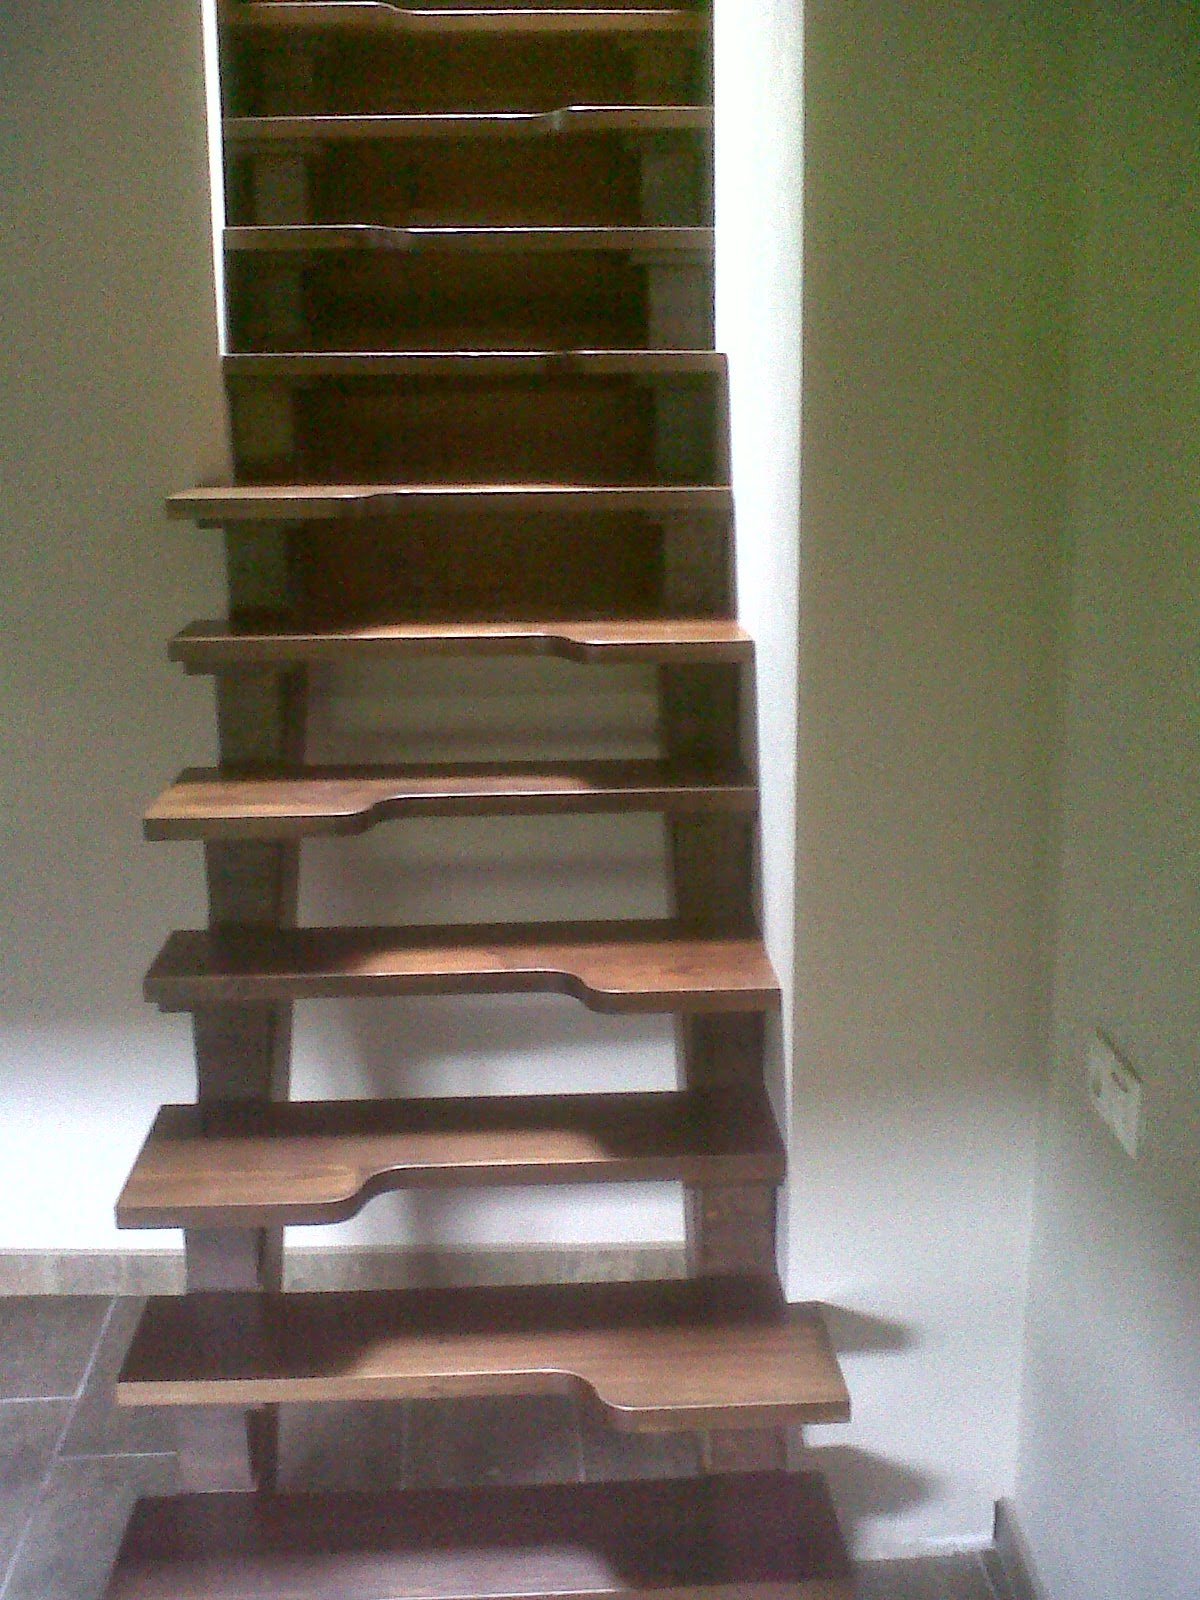 Carpinteria viosca roda escalera con pelda os reducidos - Peldanos de madera para escalera ...